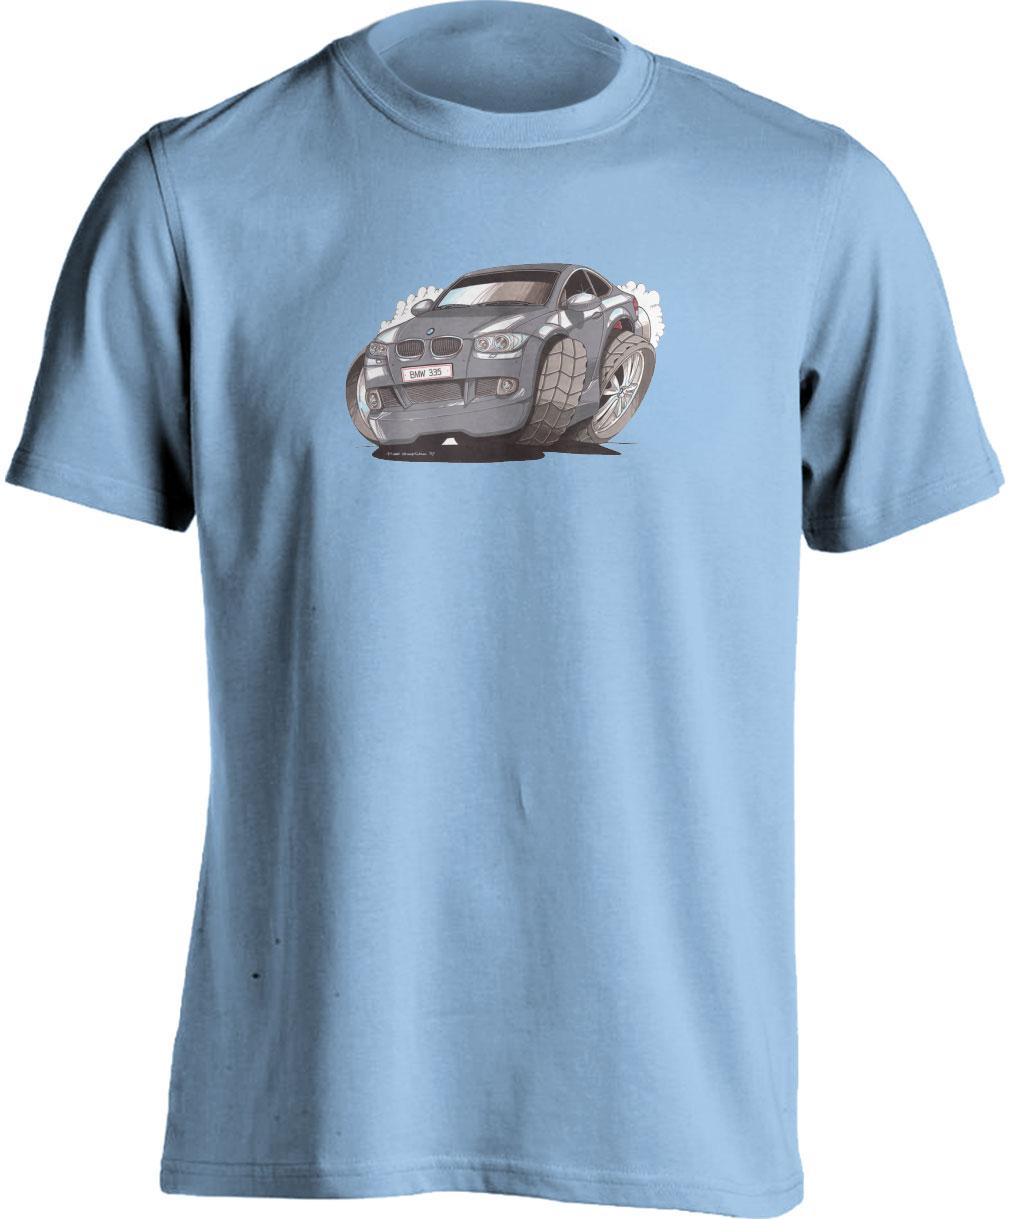 Koolart BMW 335I Silver-2174 Child's Motor Vehicle Kartoon T Shirt